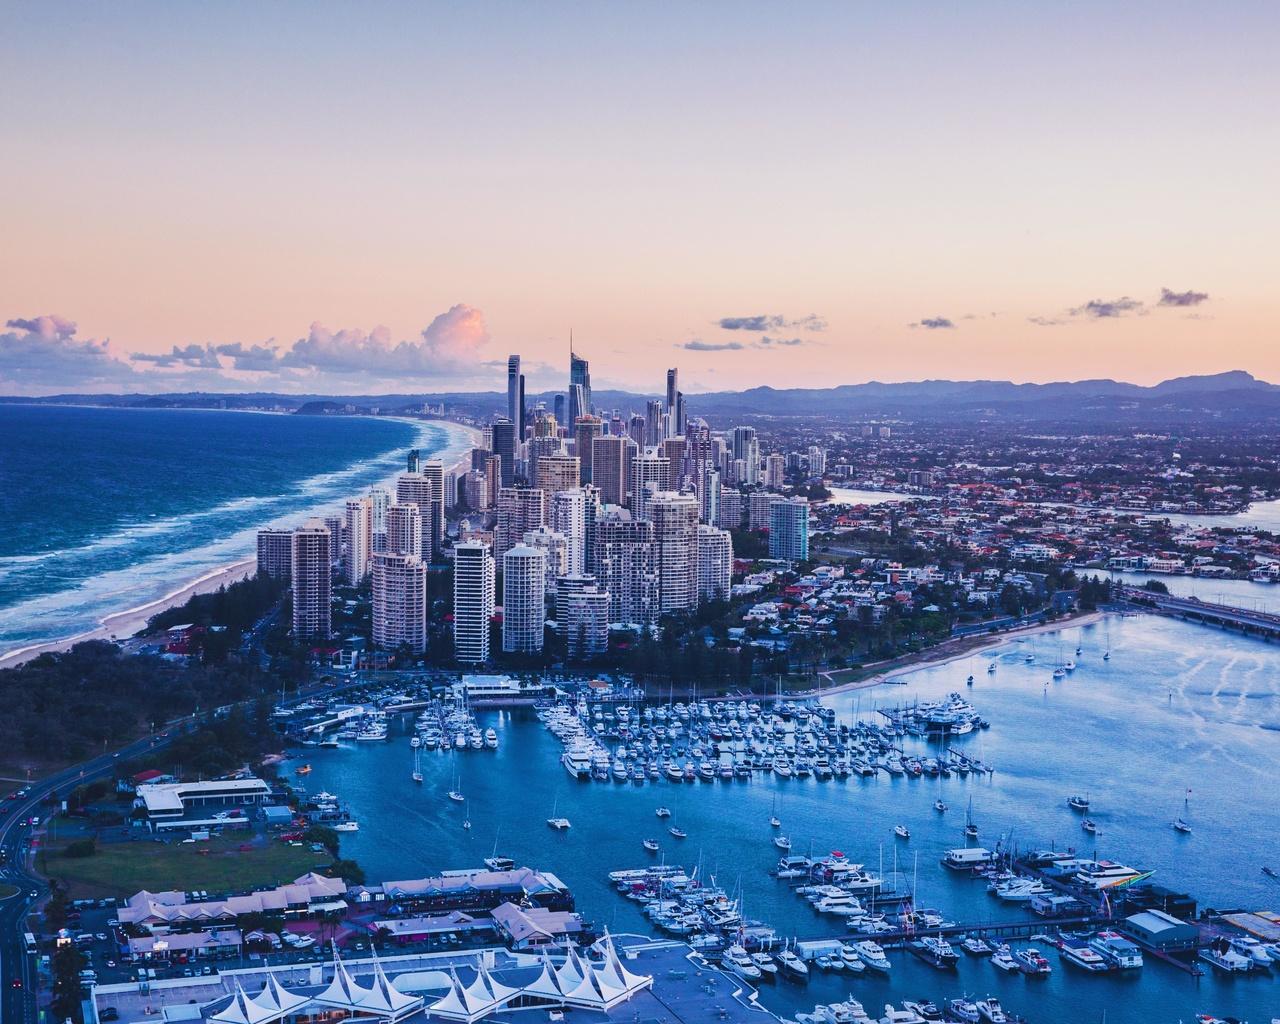 город, вид сверху, архитектура, океан, побережье